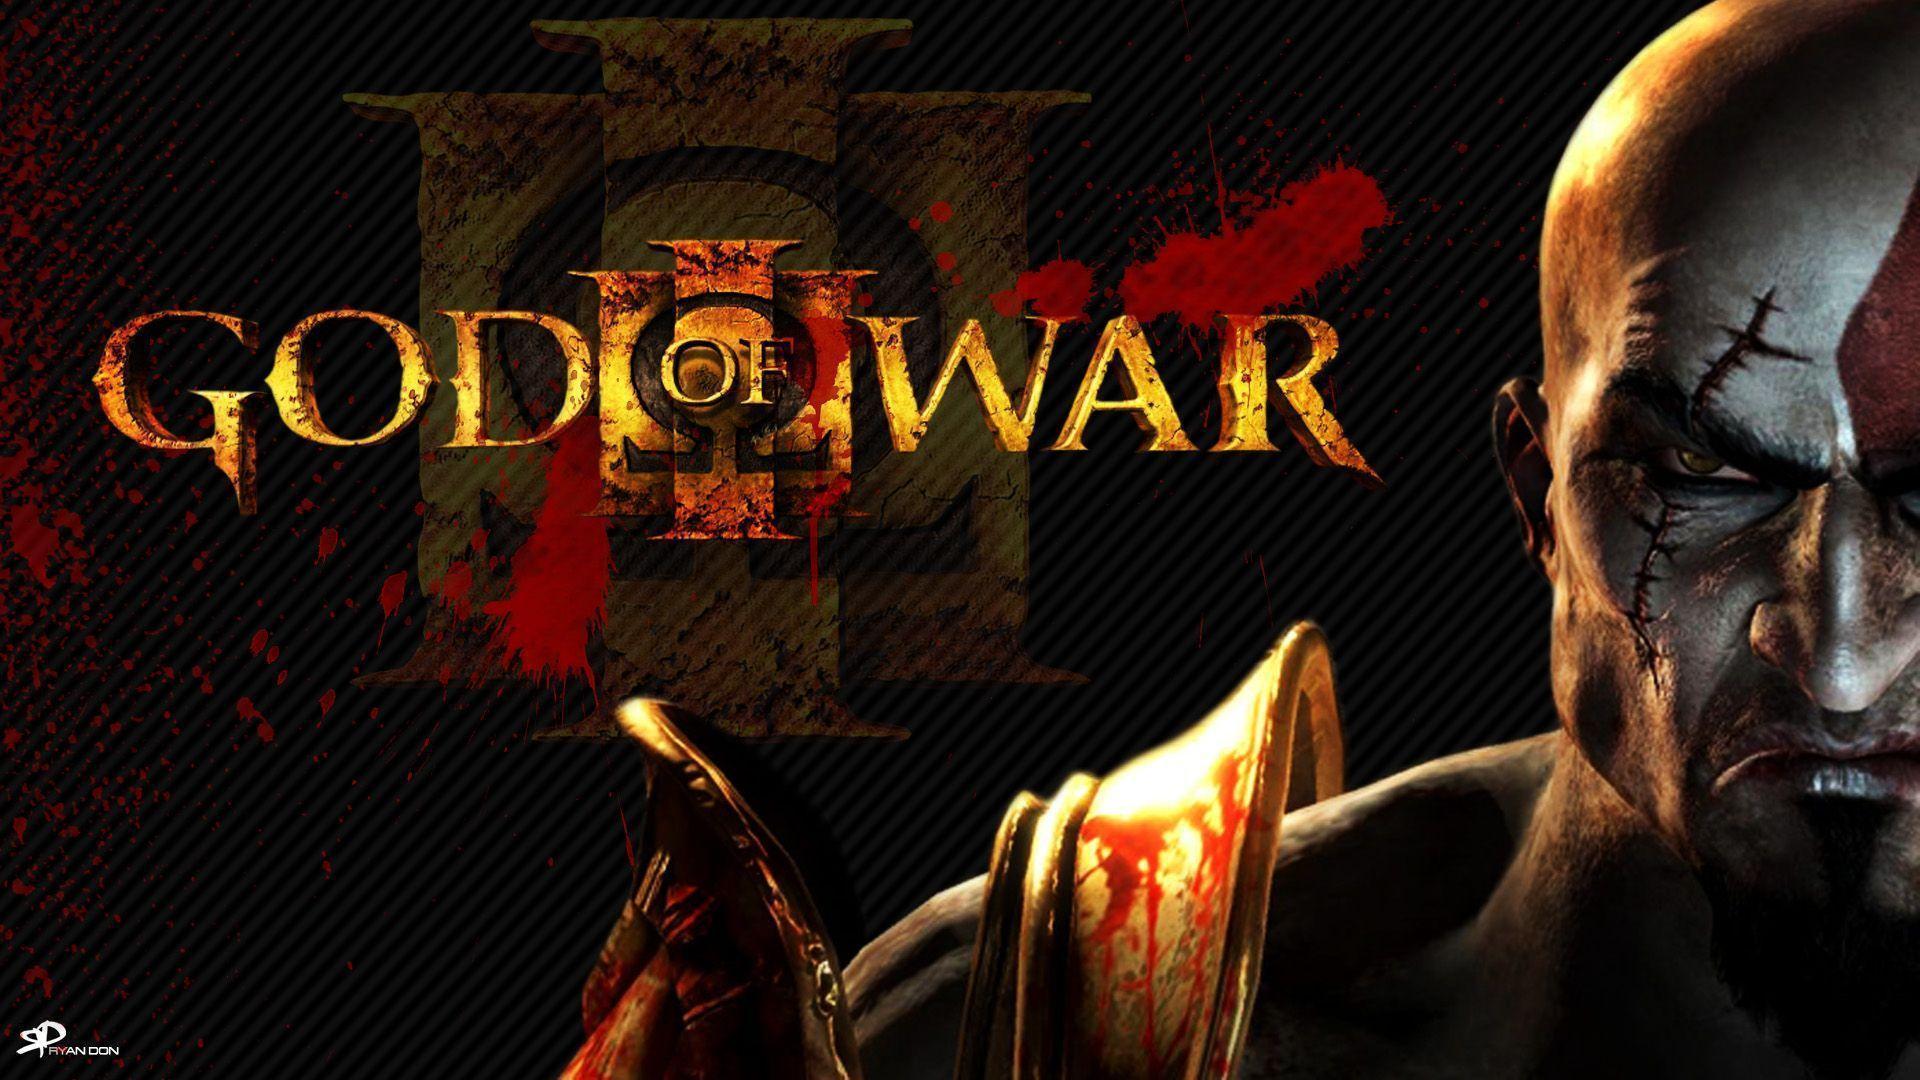 God of War III - Kratos Wallpaper